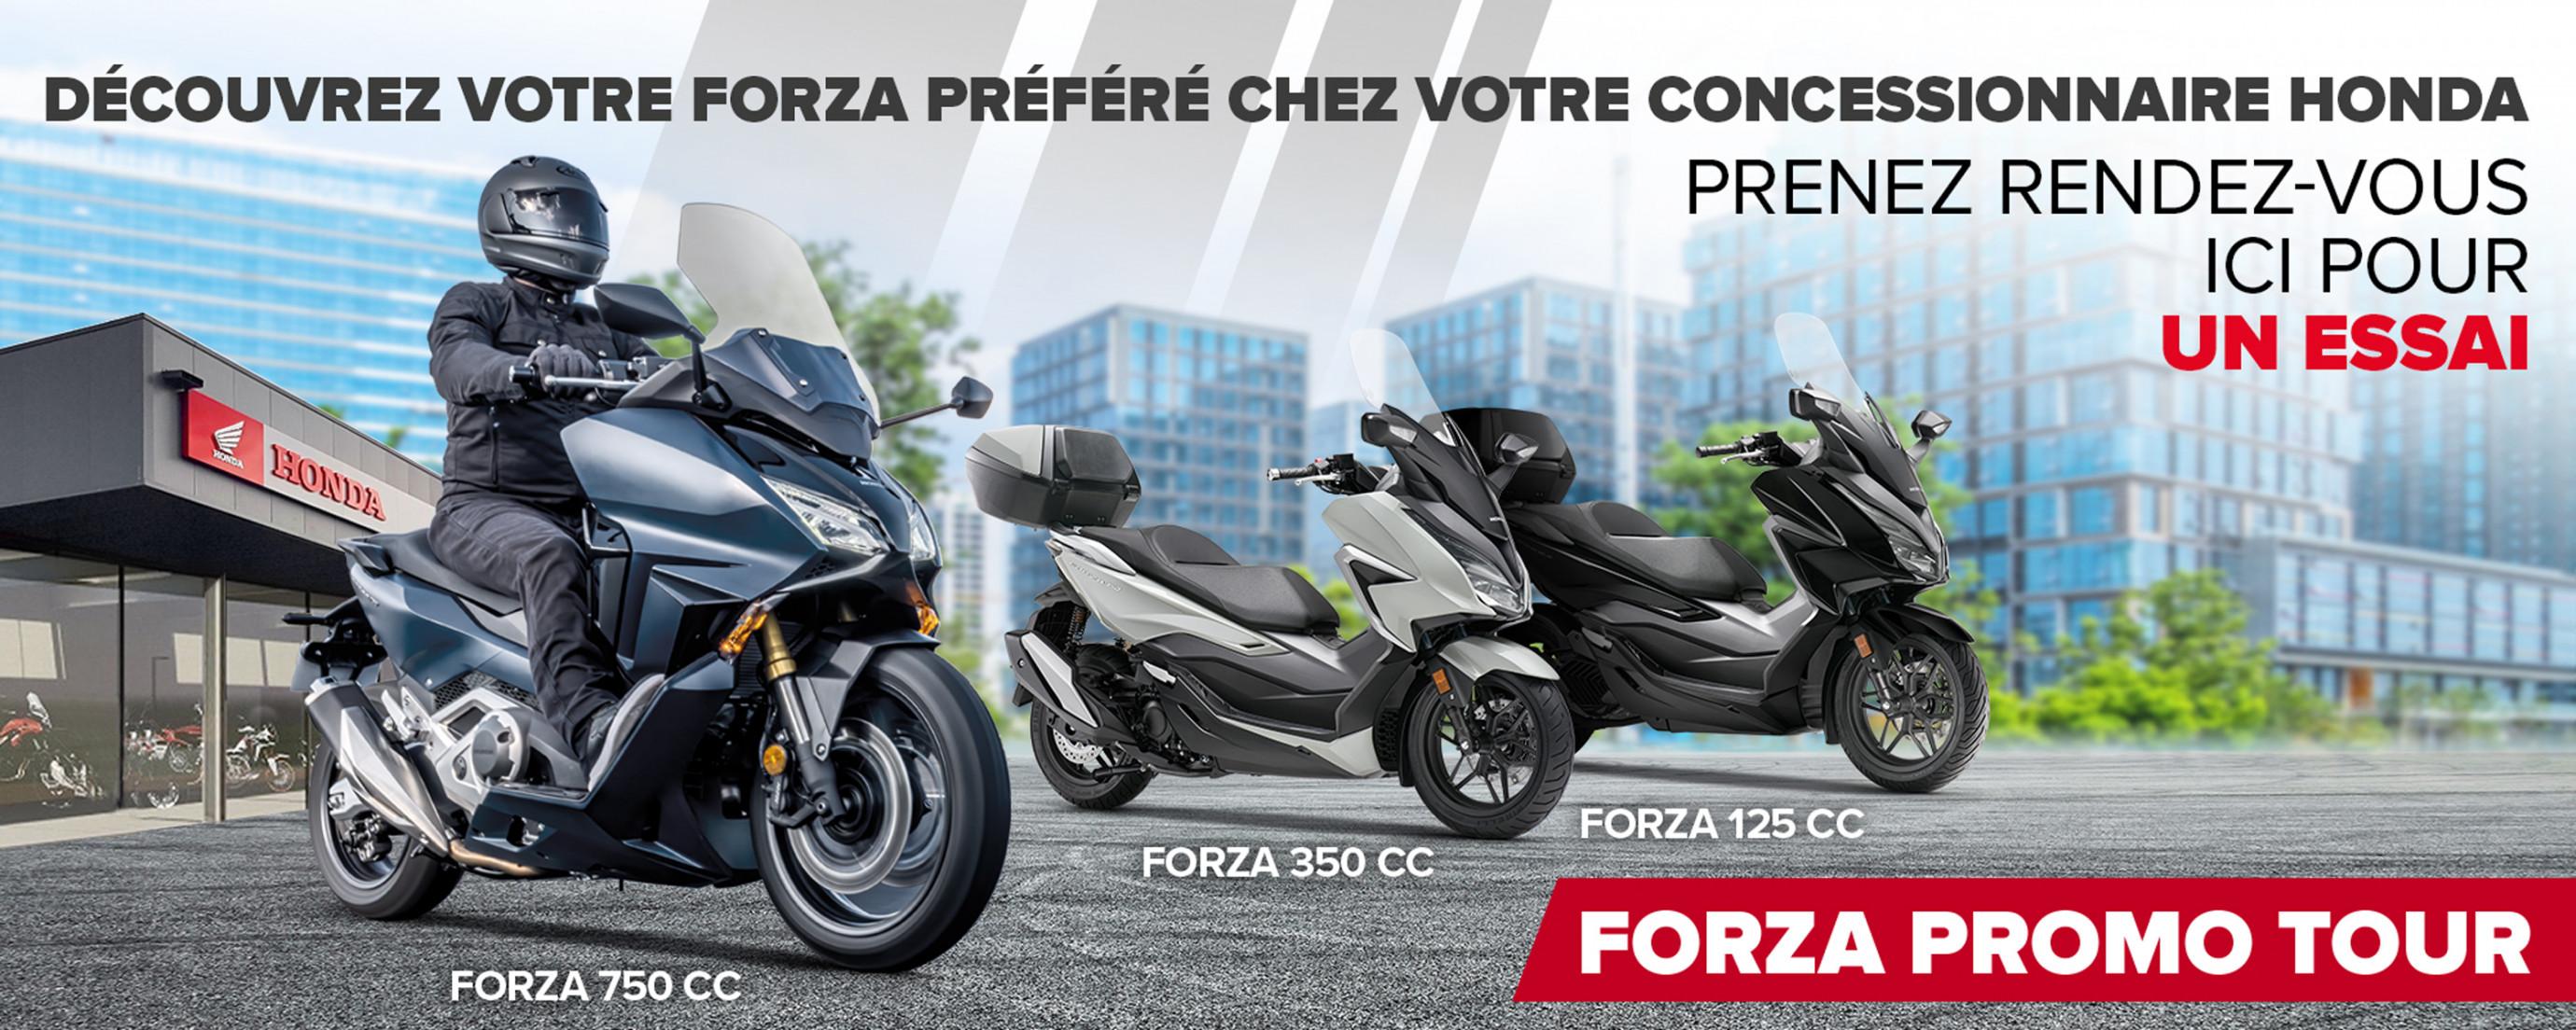 Forza-3000x12000_FR